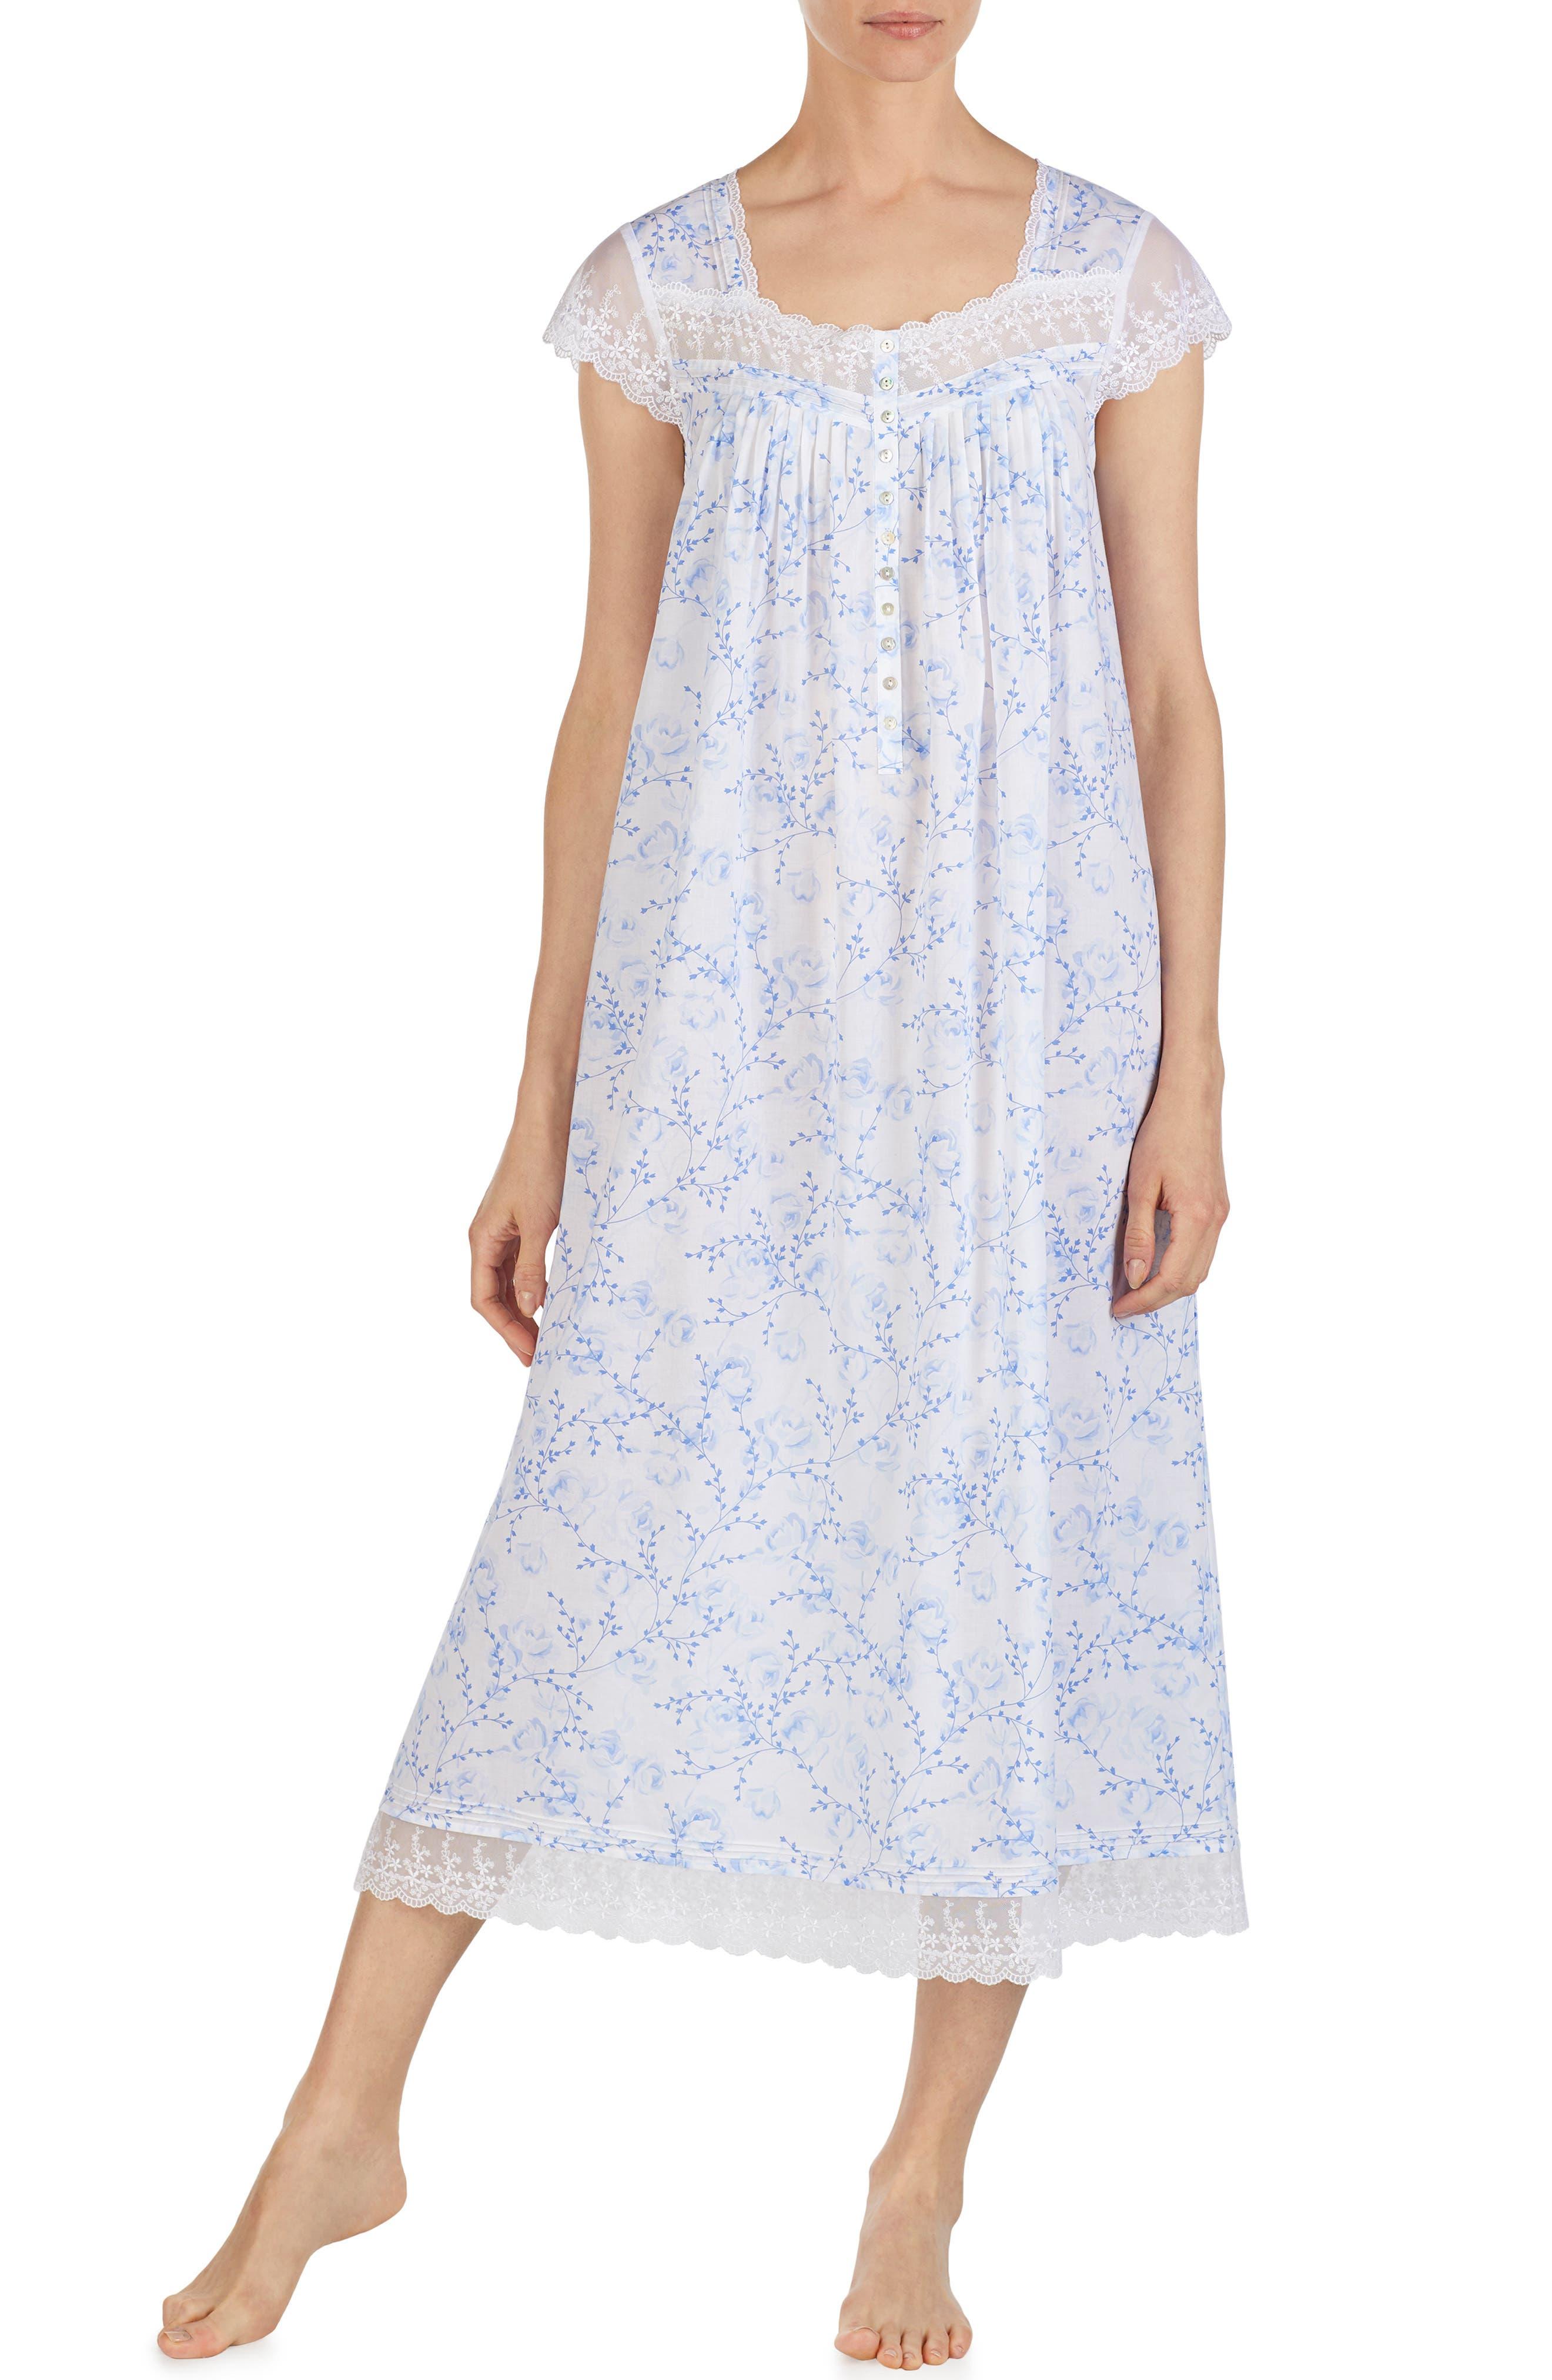 EILEEN WEST, Cotton Lawn Nightgown, Main thumbnail 1, color, BLUE FLORAL